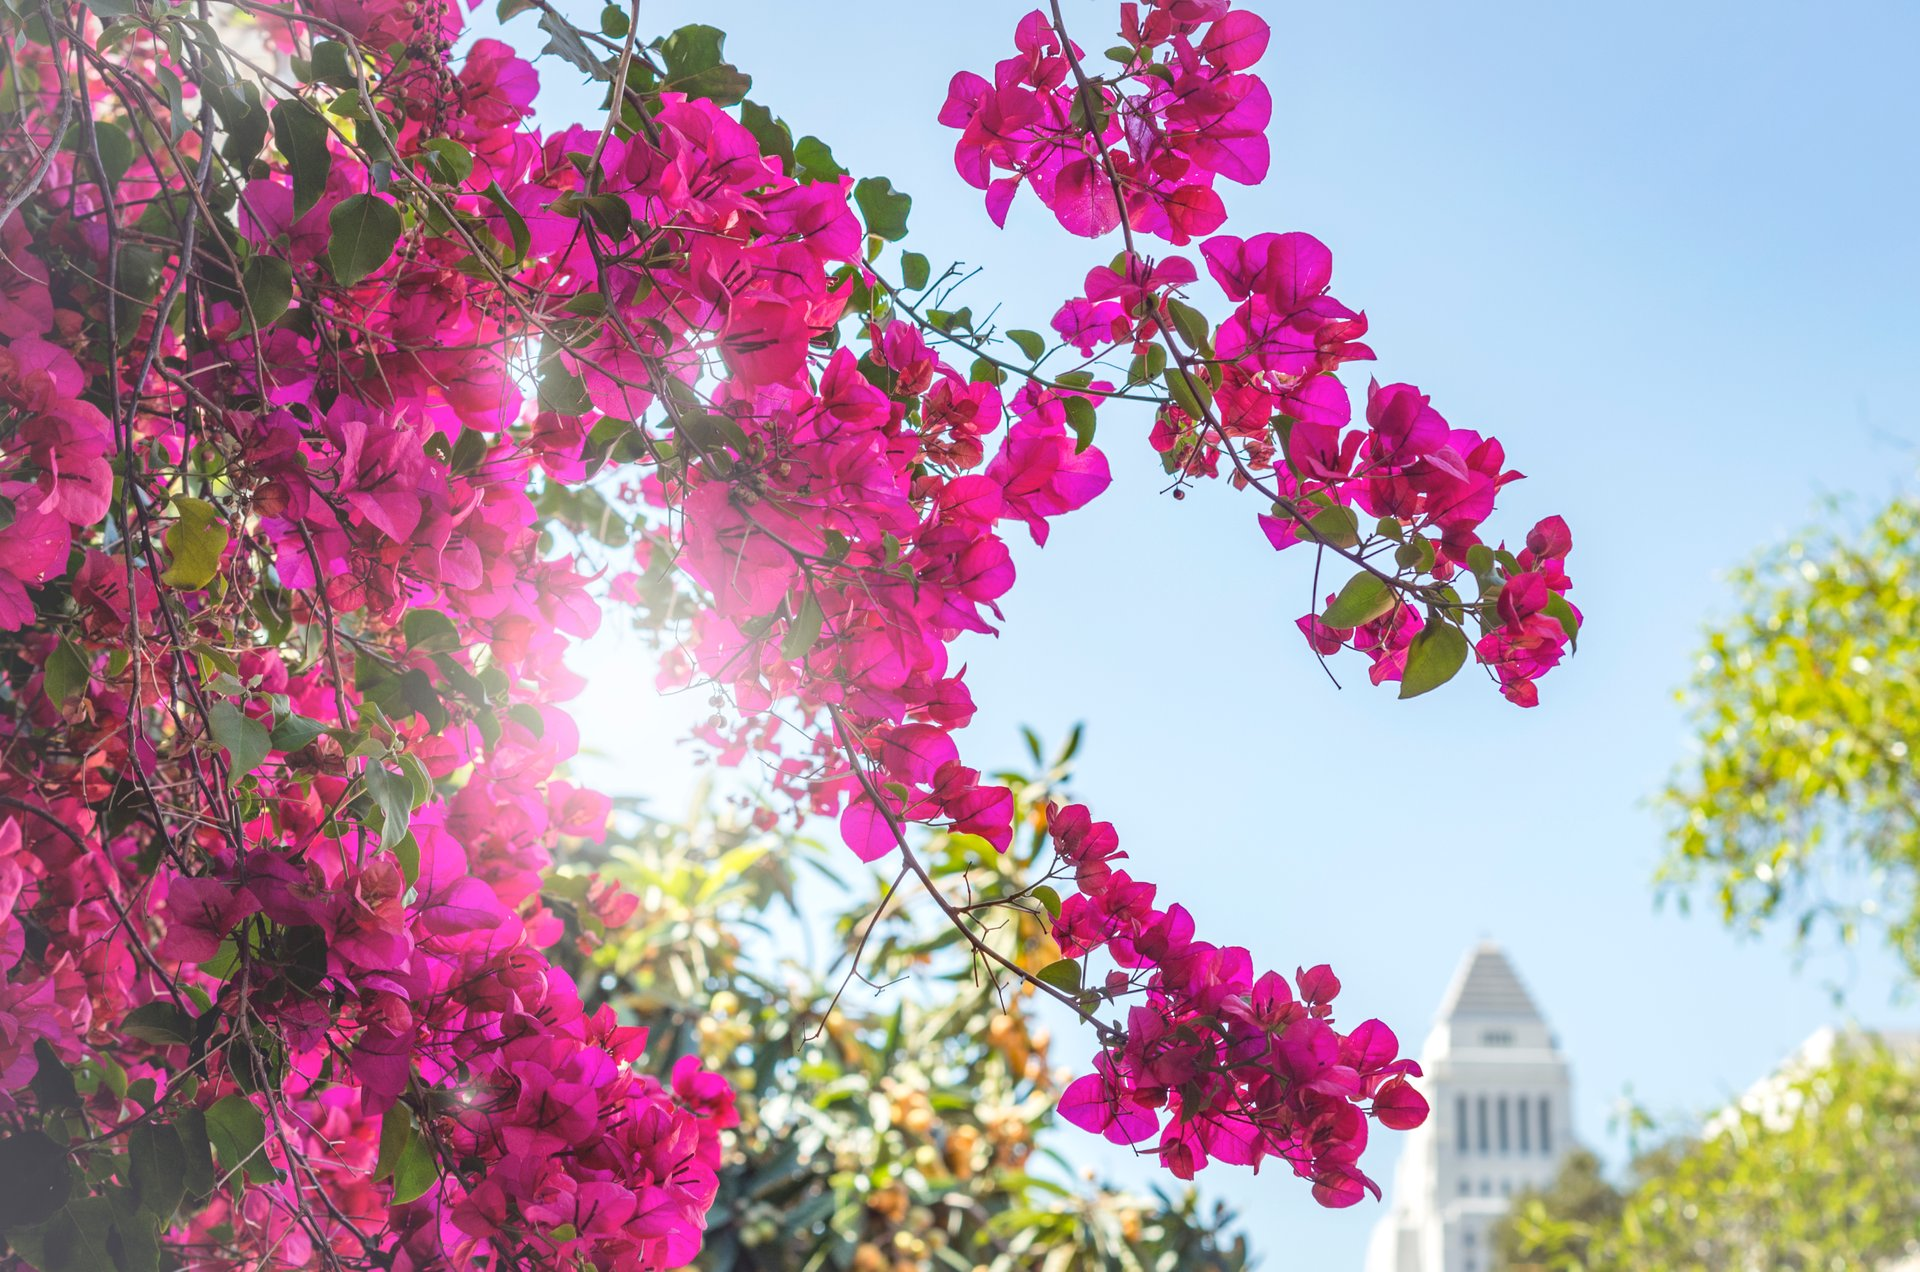 Bougainvillea Bloom in Los Angeles 2020 - Best Time